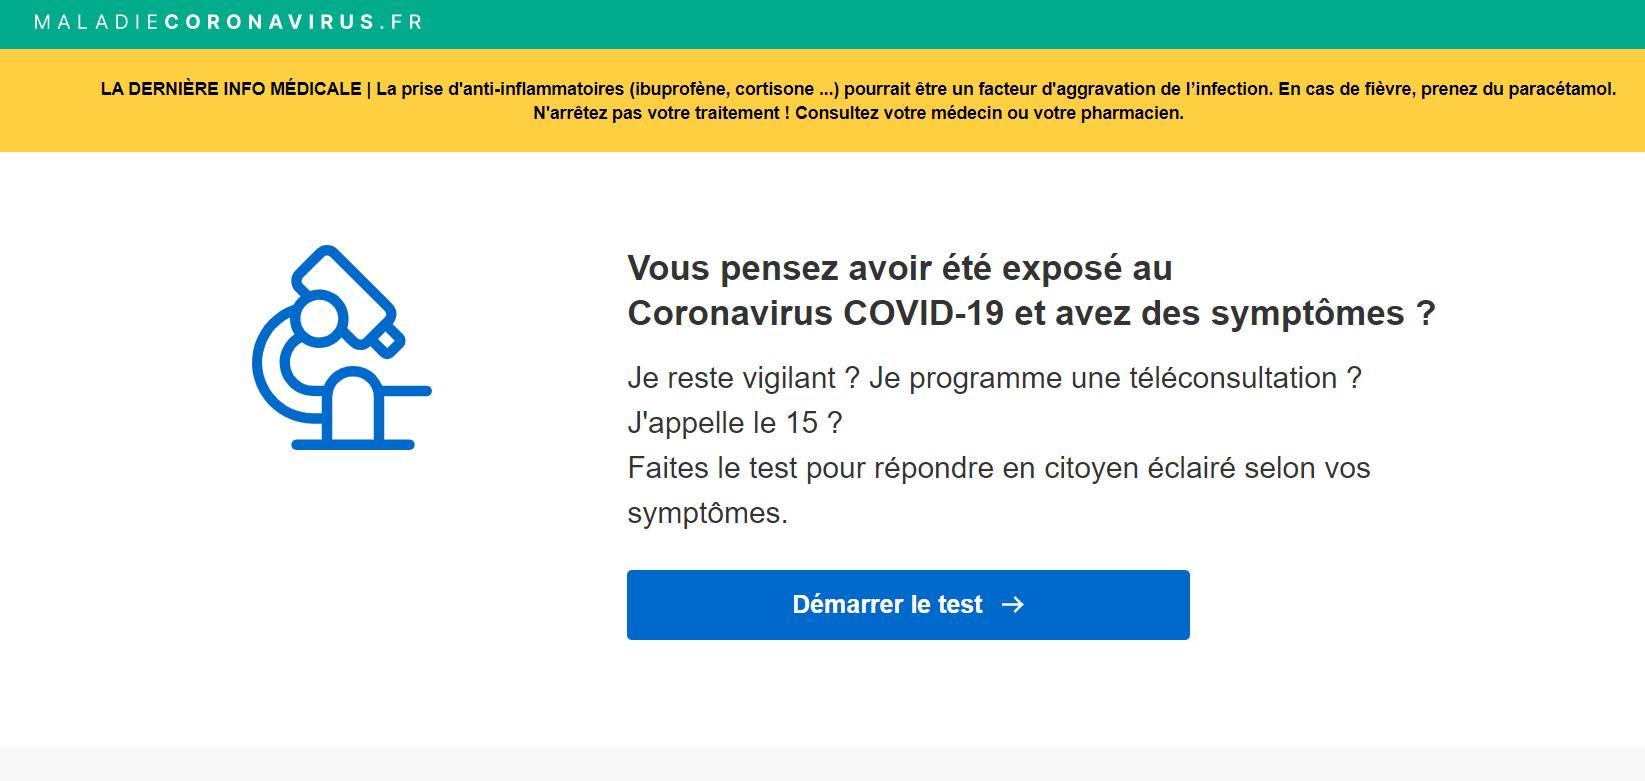 Blog Doctoome - Maladiecoronavirus.fr : un site pour s'auto-tester